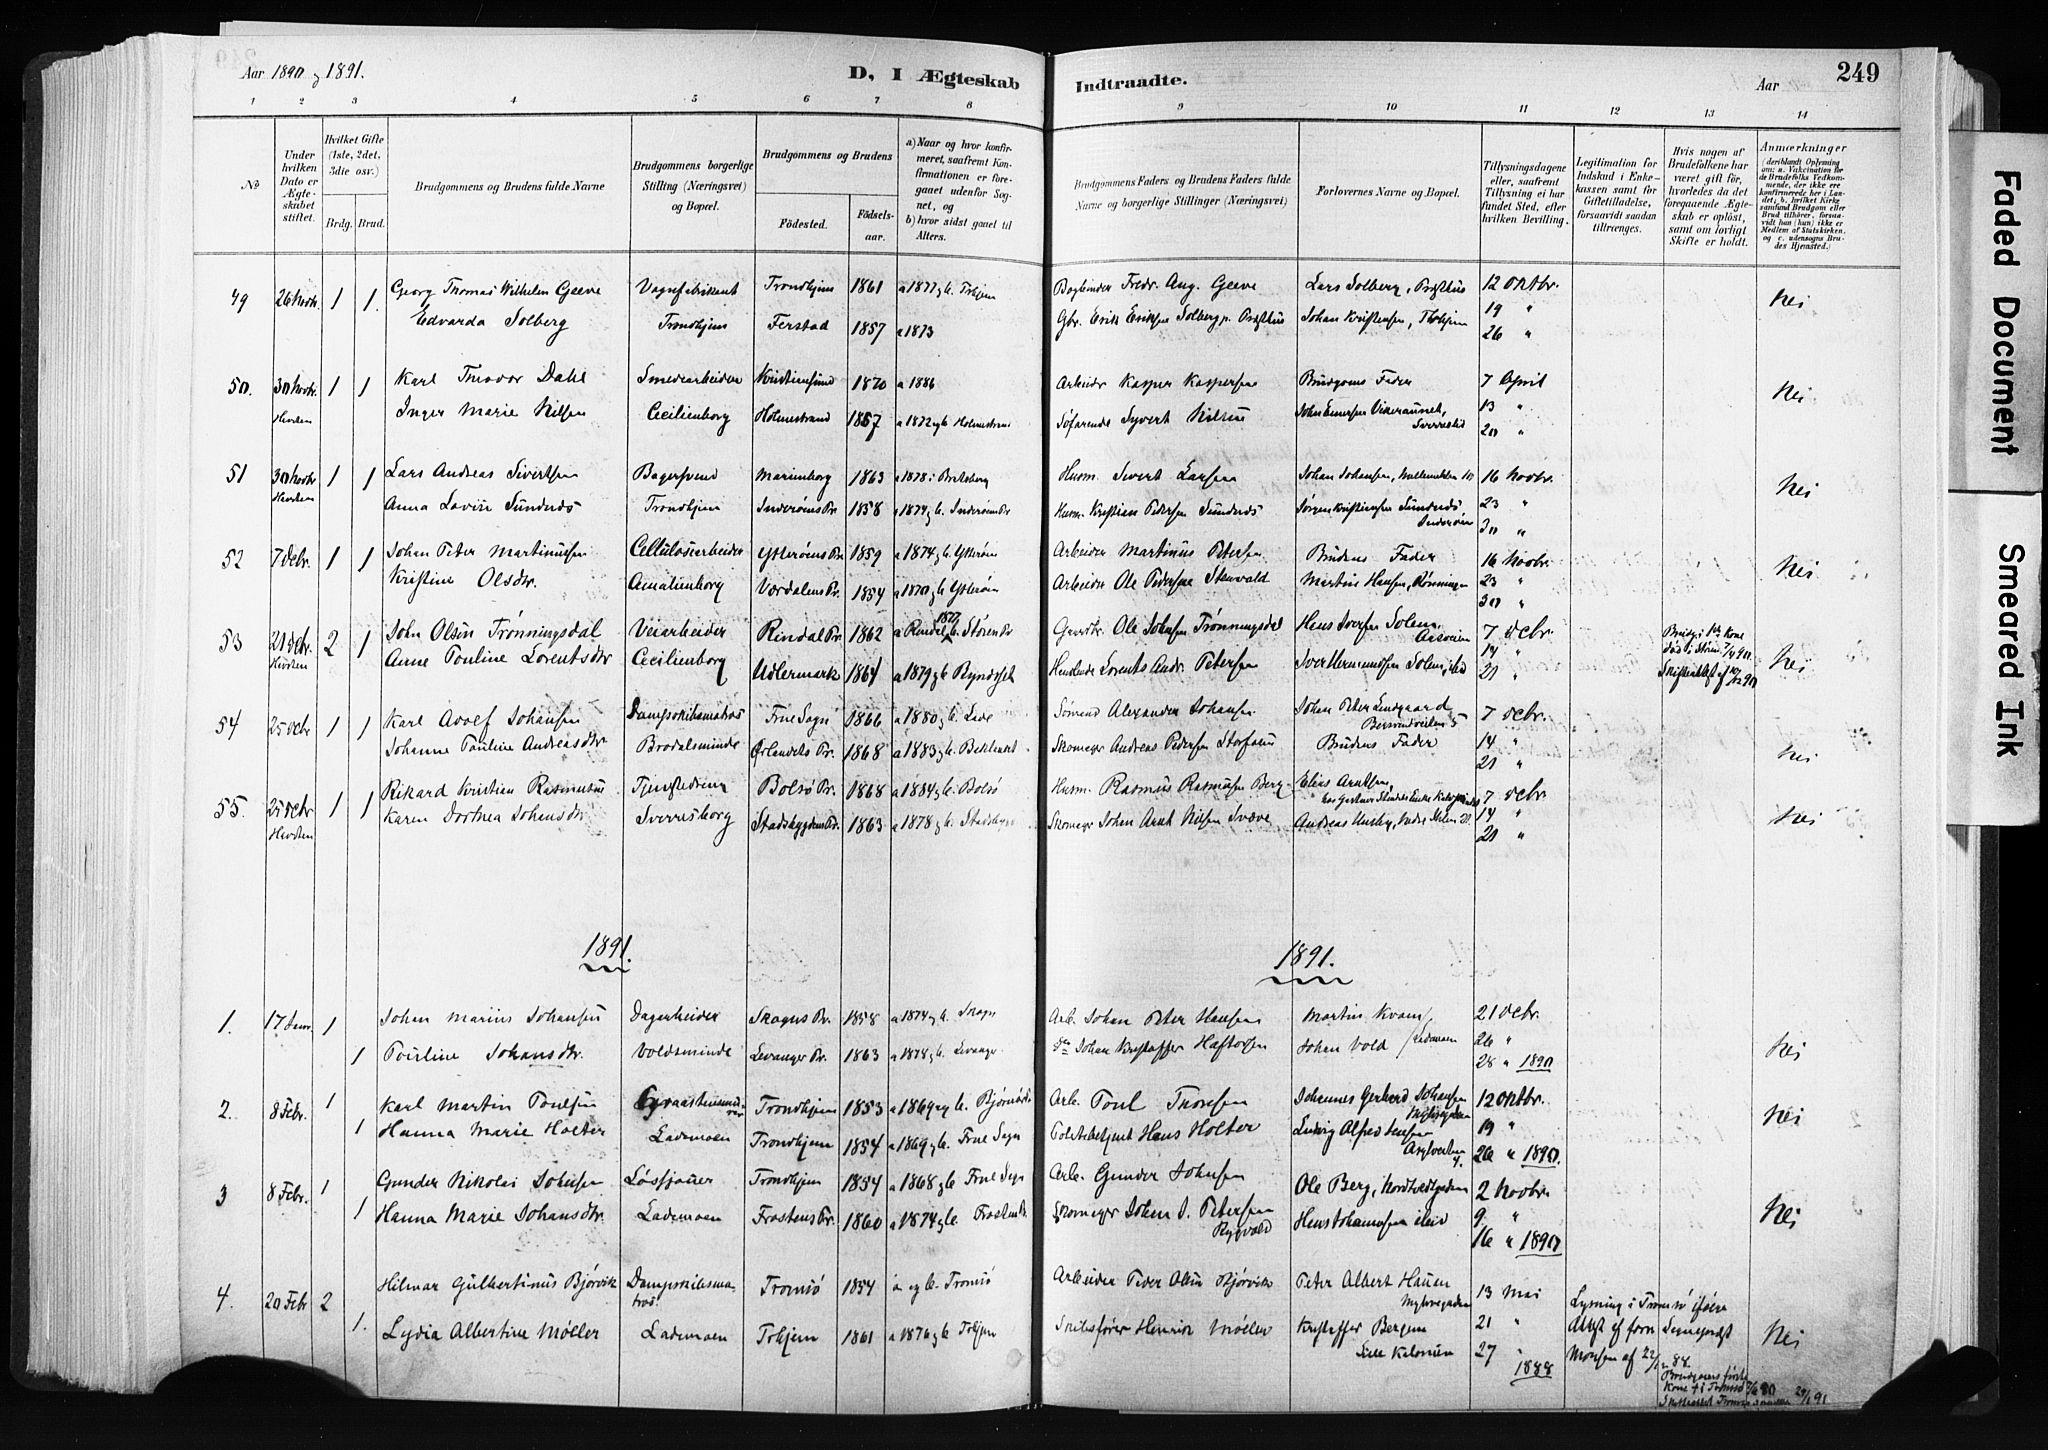 SAT, Ministerialprotokoller, klokkerbøker og fødselsregistre - Sør-Trøndelag, 606/L0300: Parish register (official) no. 606A15, 1886-1893, p. 249